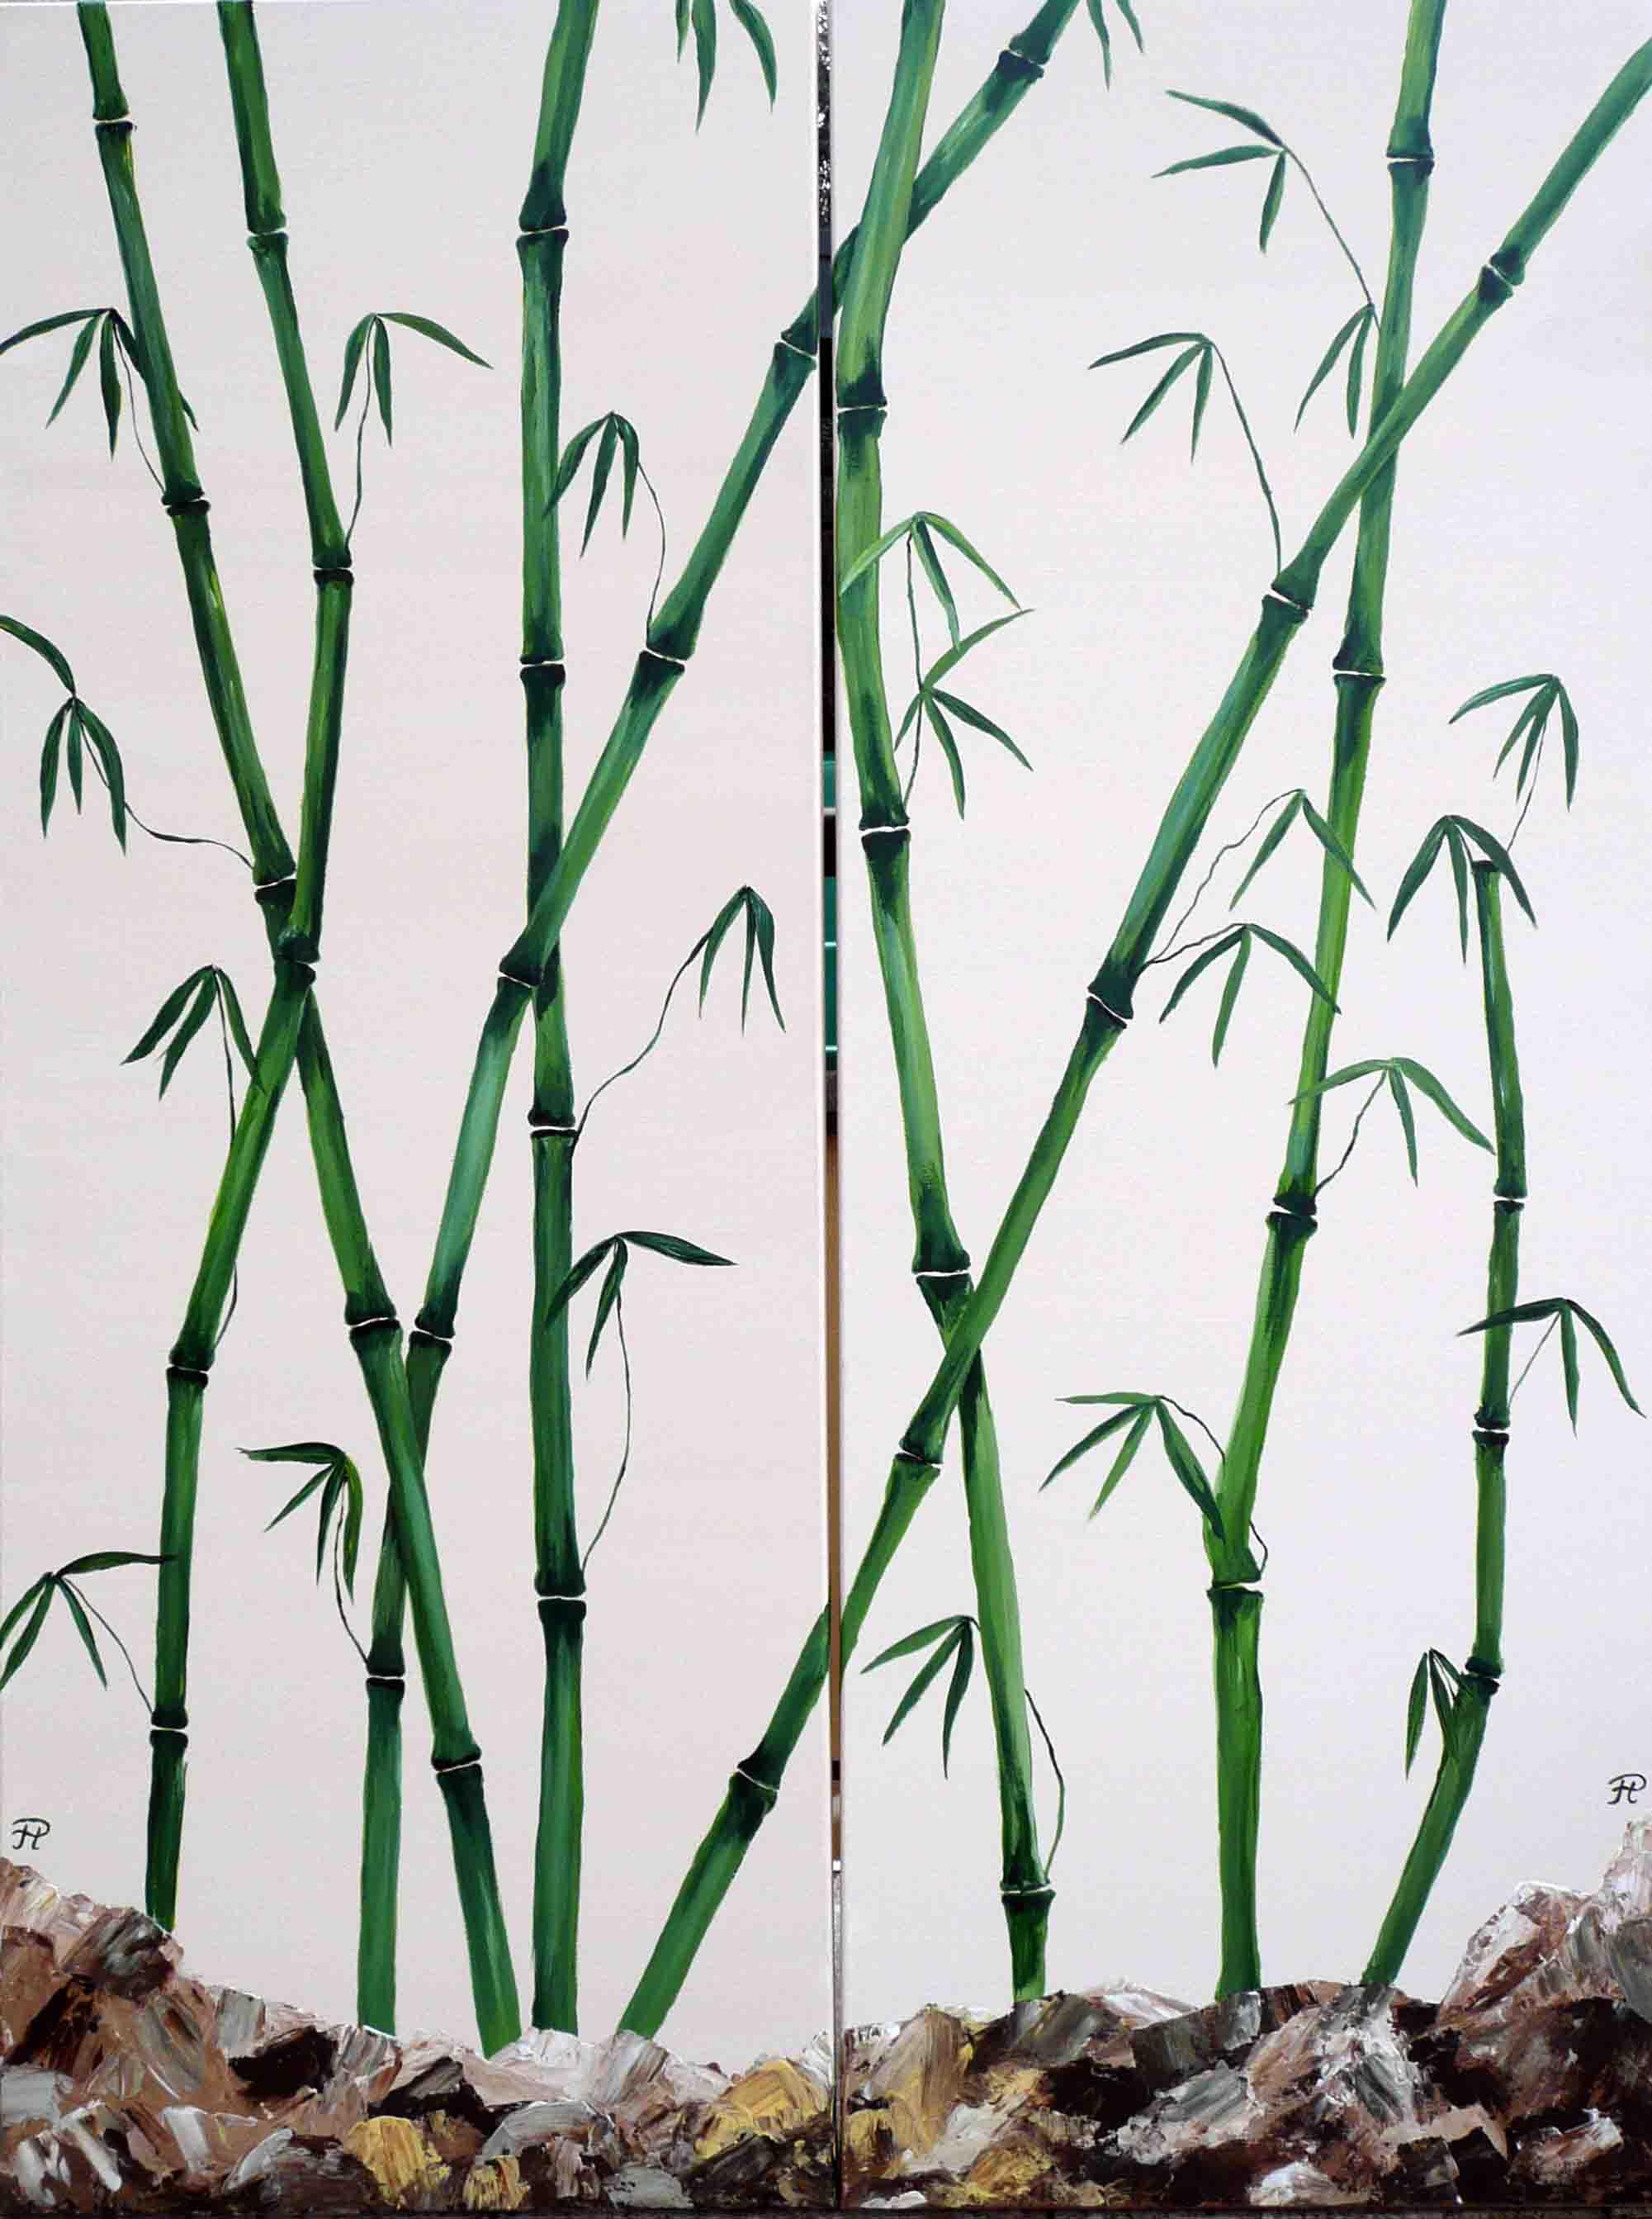 bild bambus baum china flora von petra h rsch bei kunstnet. Black Bedroom Furniture Sets. Home Design Ideas